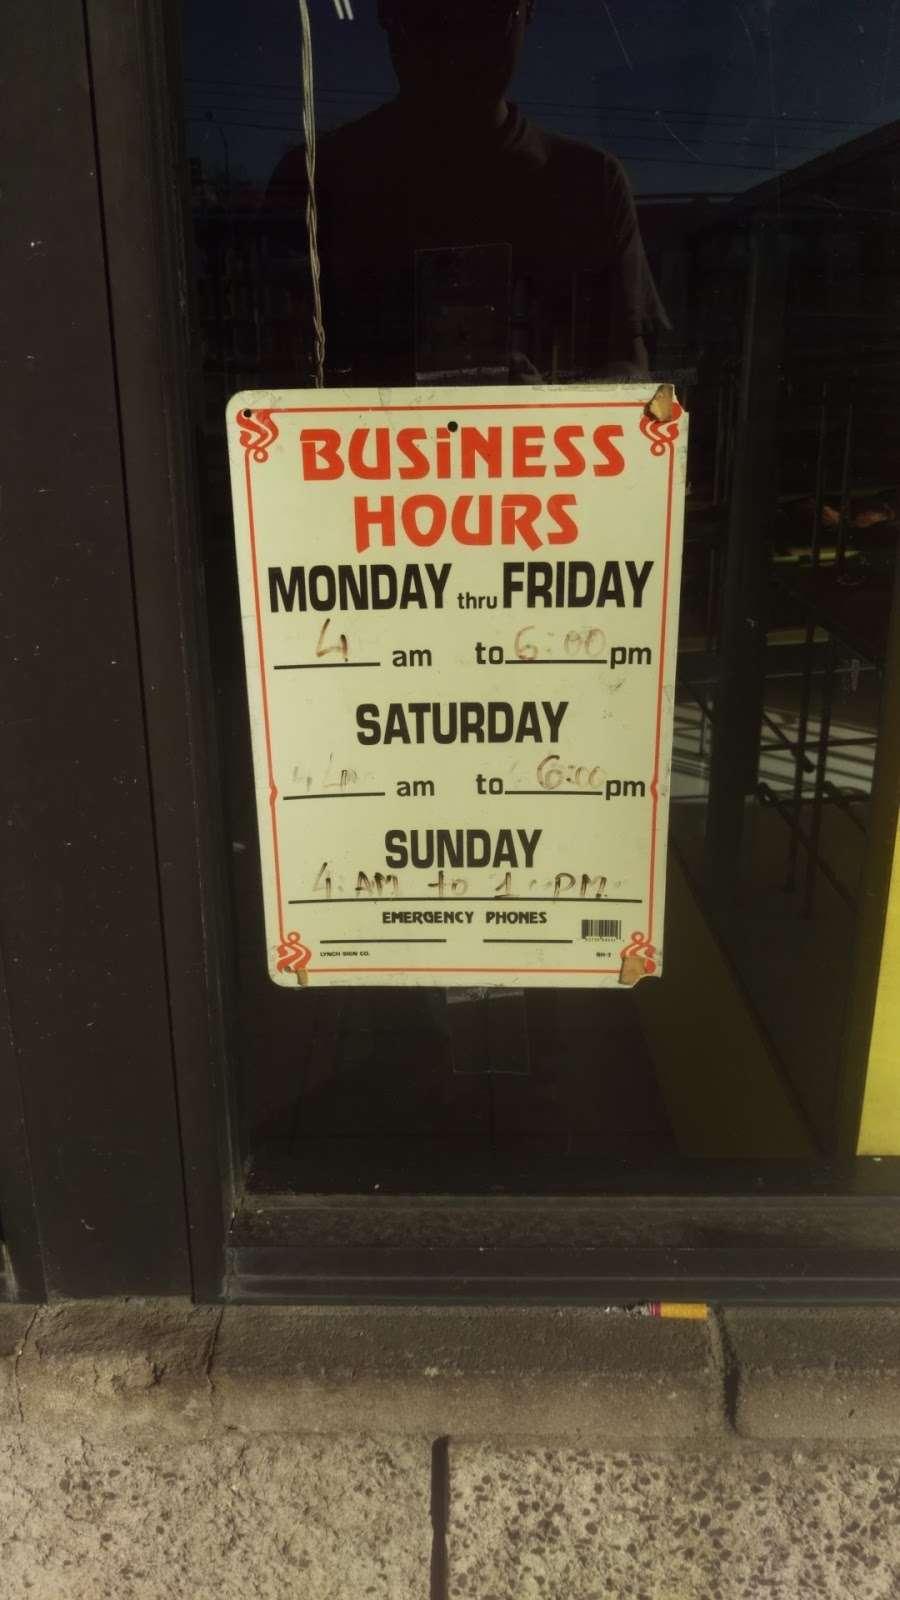 Good Donut - cafe  | Photo 3 of 6 | Address: 10310 Lower Azusa Rd, El Monte, CA 91731, USA | Phone: (626) 443-2227